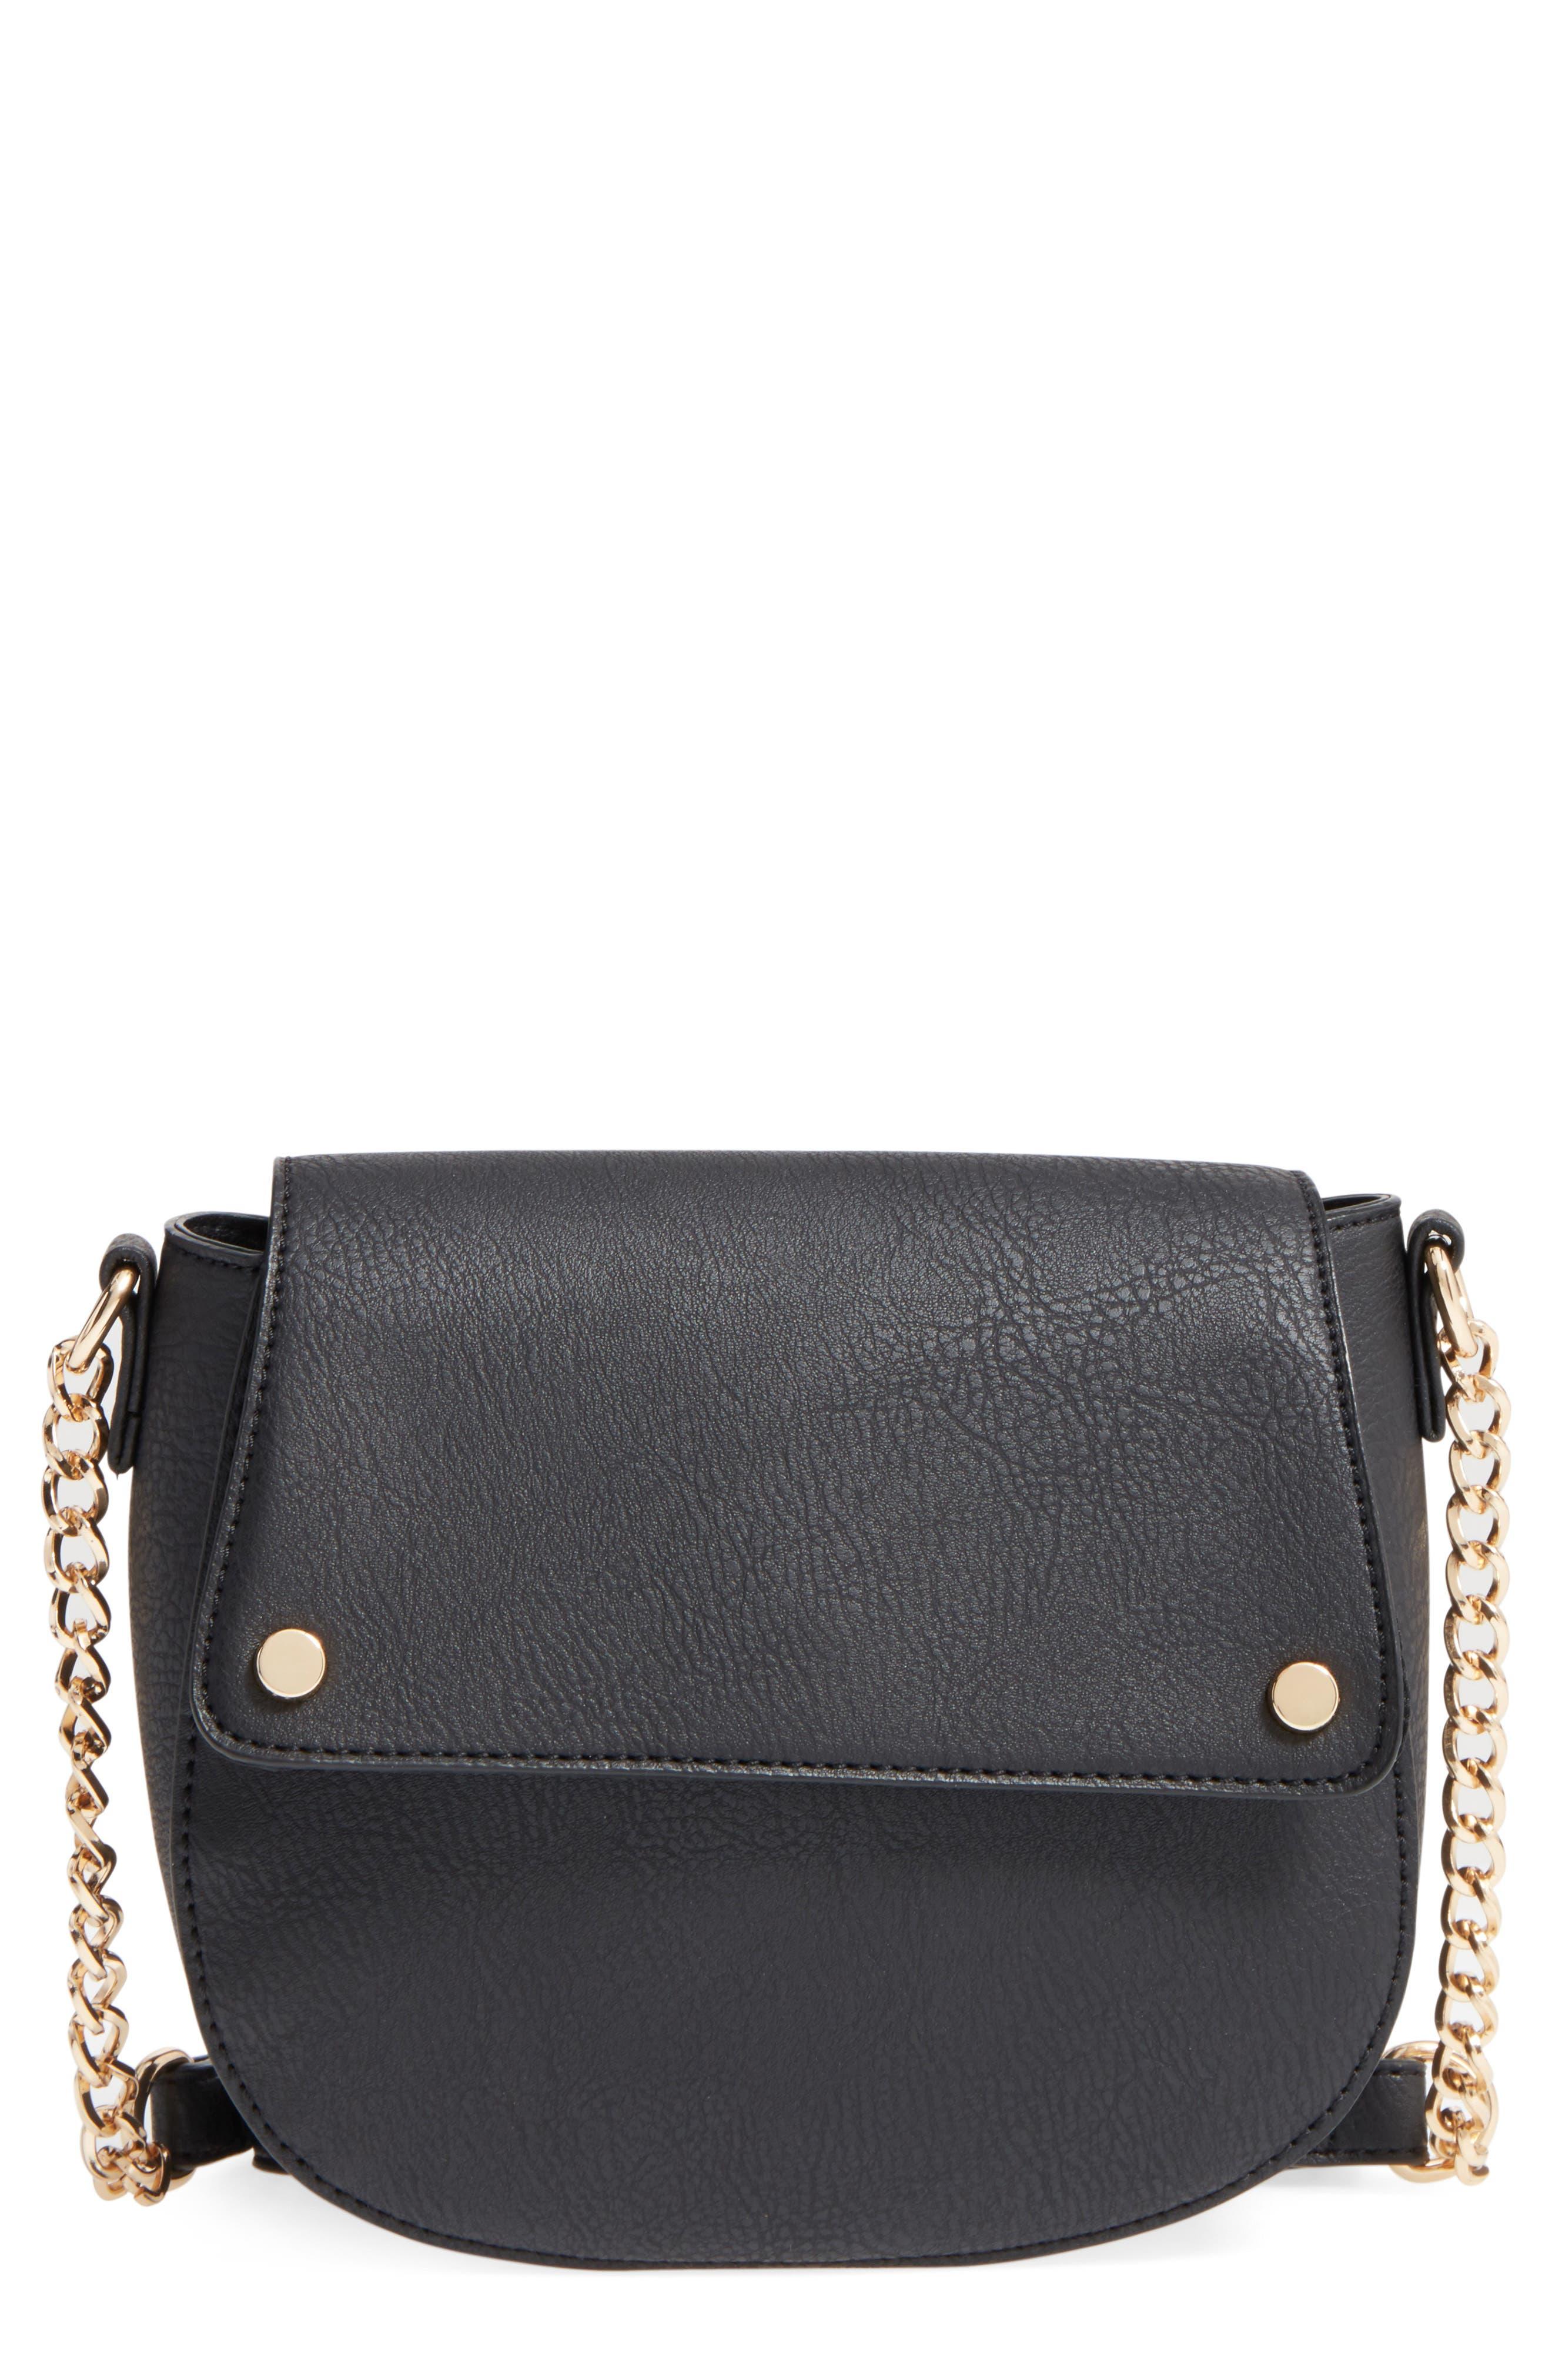 Faux Leather Saddle Flap Crossbody Bag, Main, color, 001